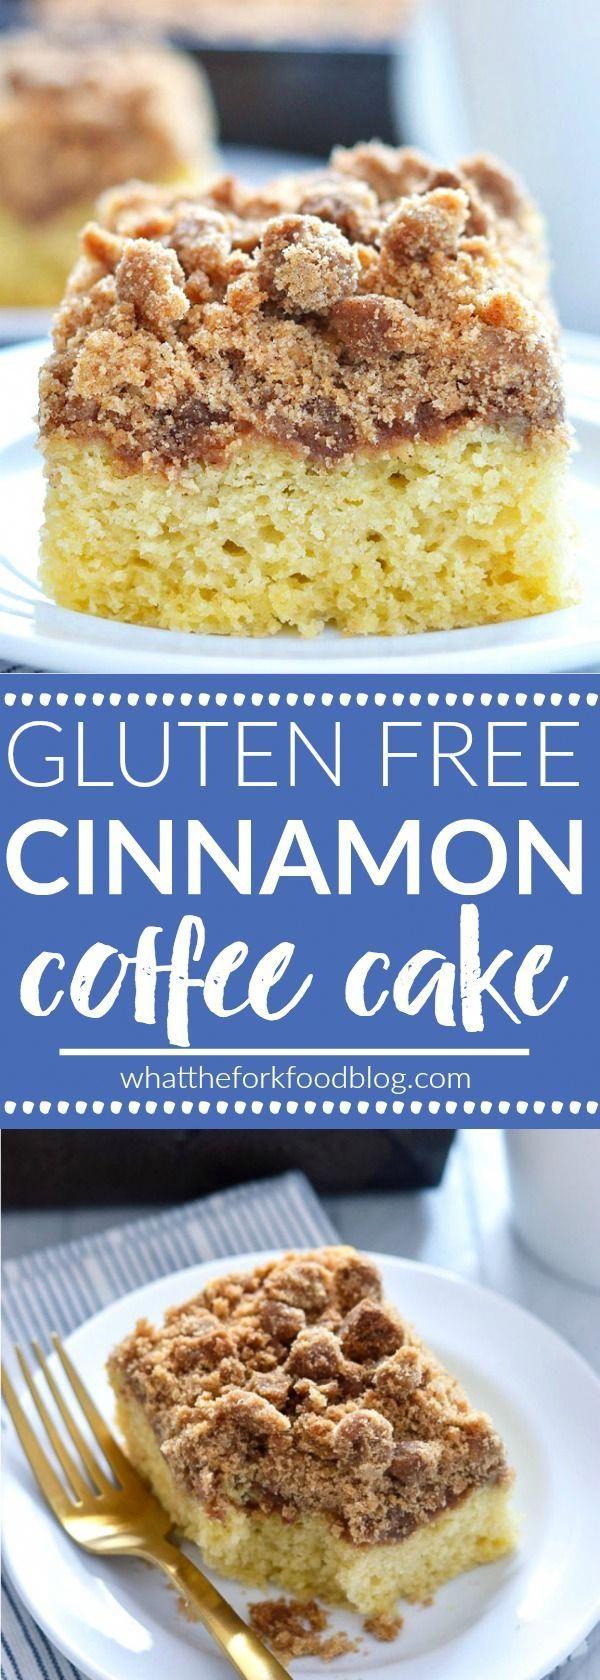 Gluten Free Desserts To Buy Near Me Gluten Free Desserts To Send Gluten Free Coffee Cake Dairy Free Recipes Gluten Free Sweets